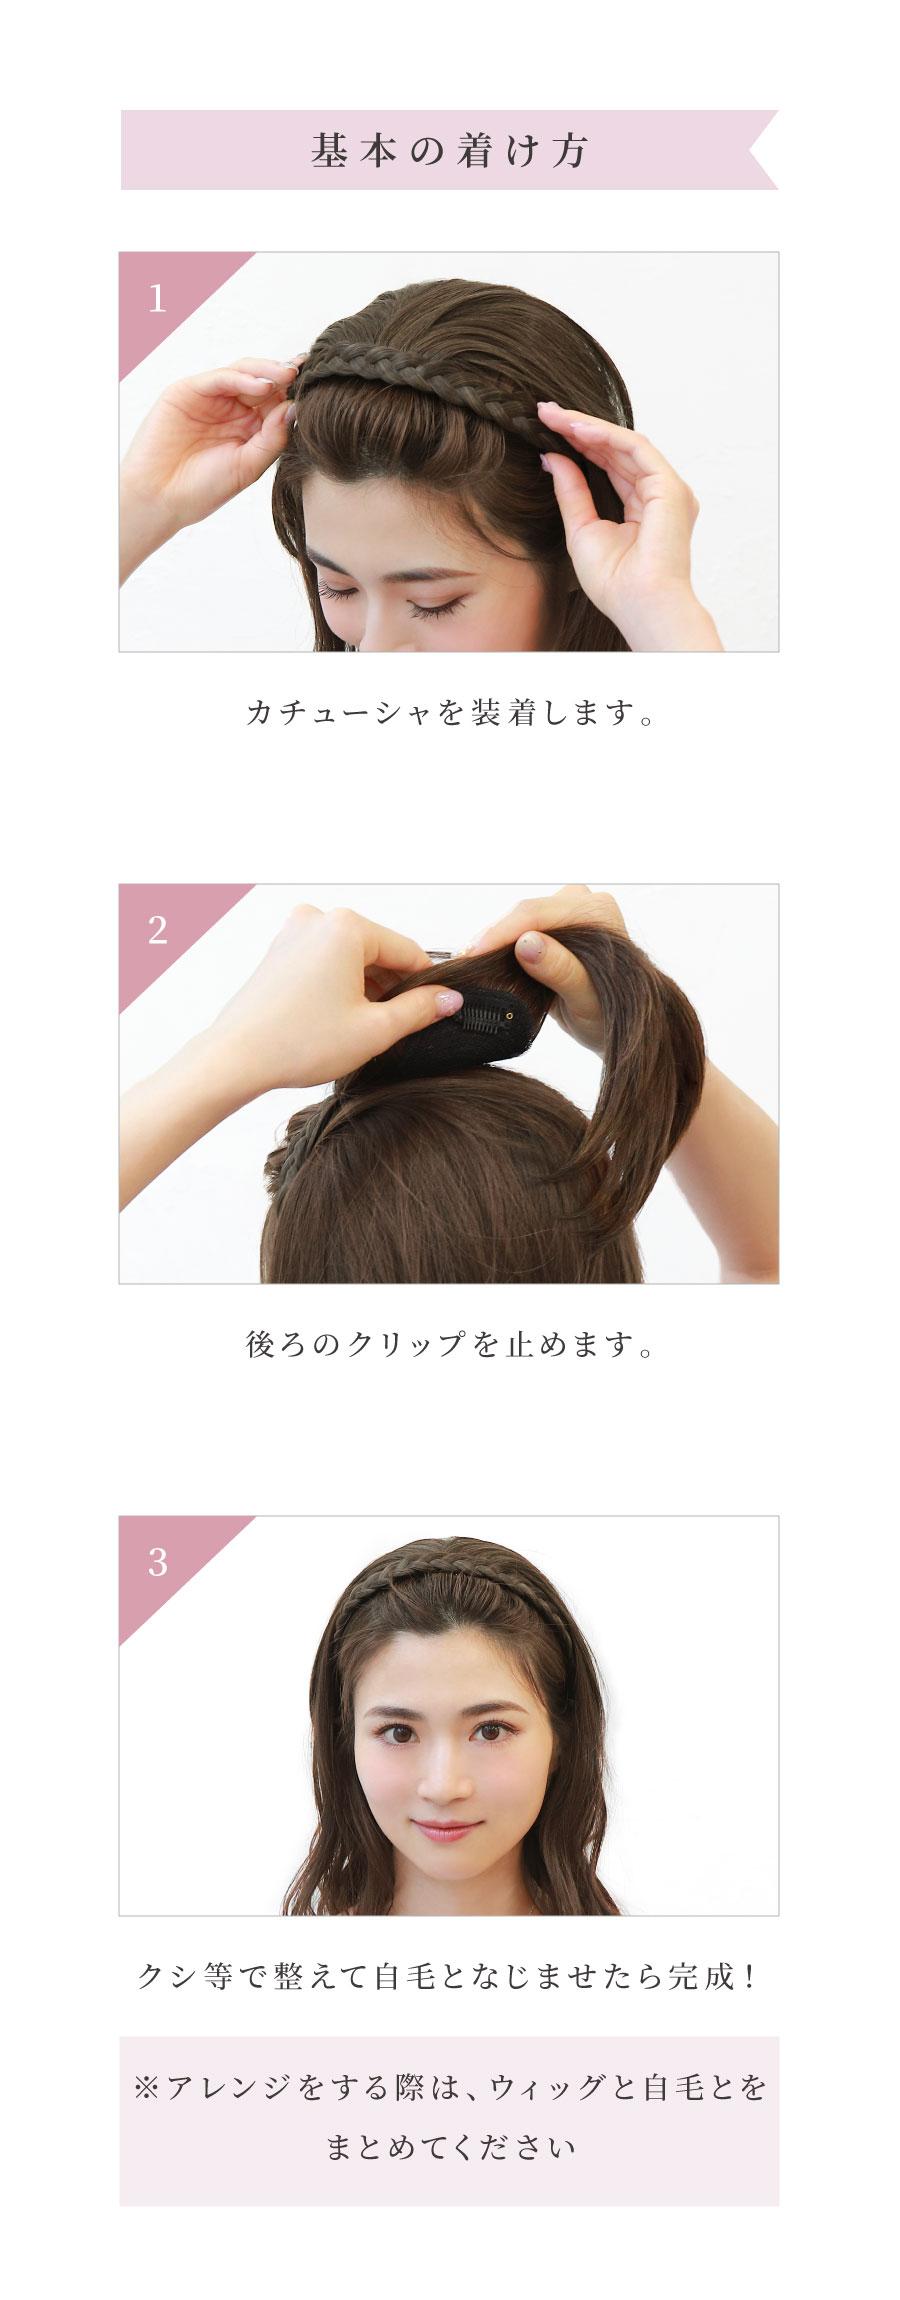 PG-10 カチューシャヘアプラス 基本の着け方